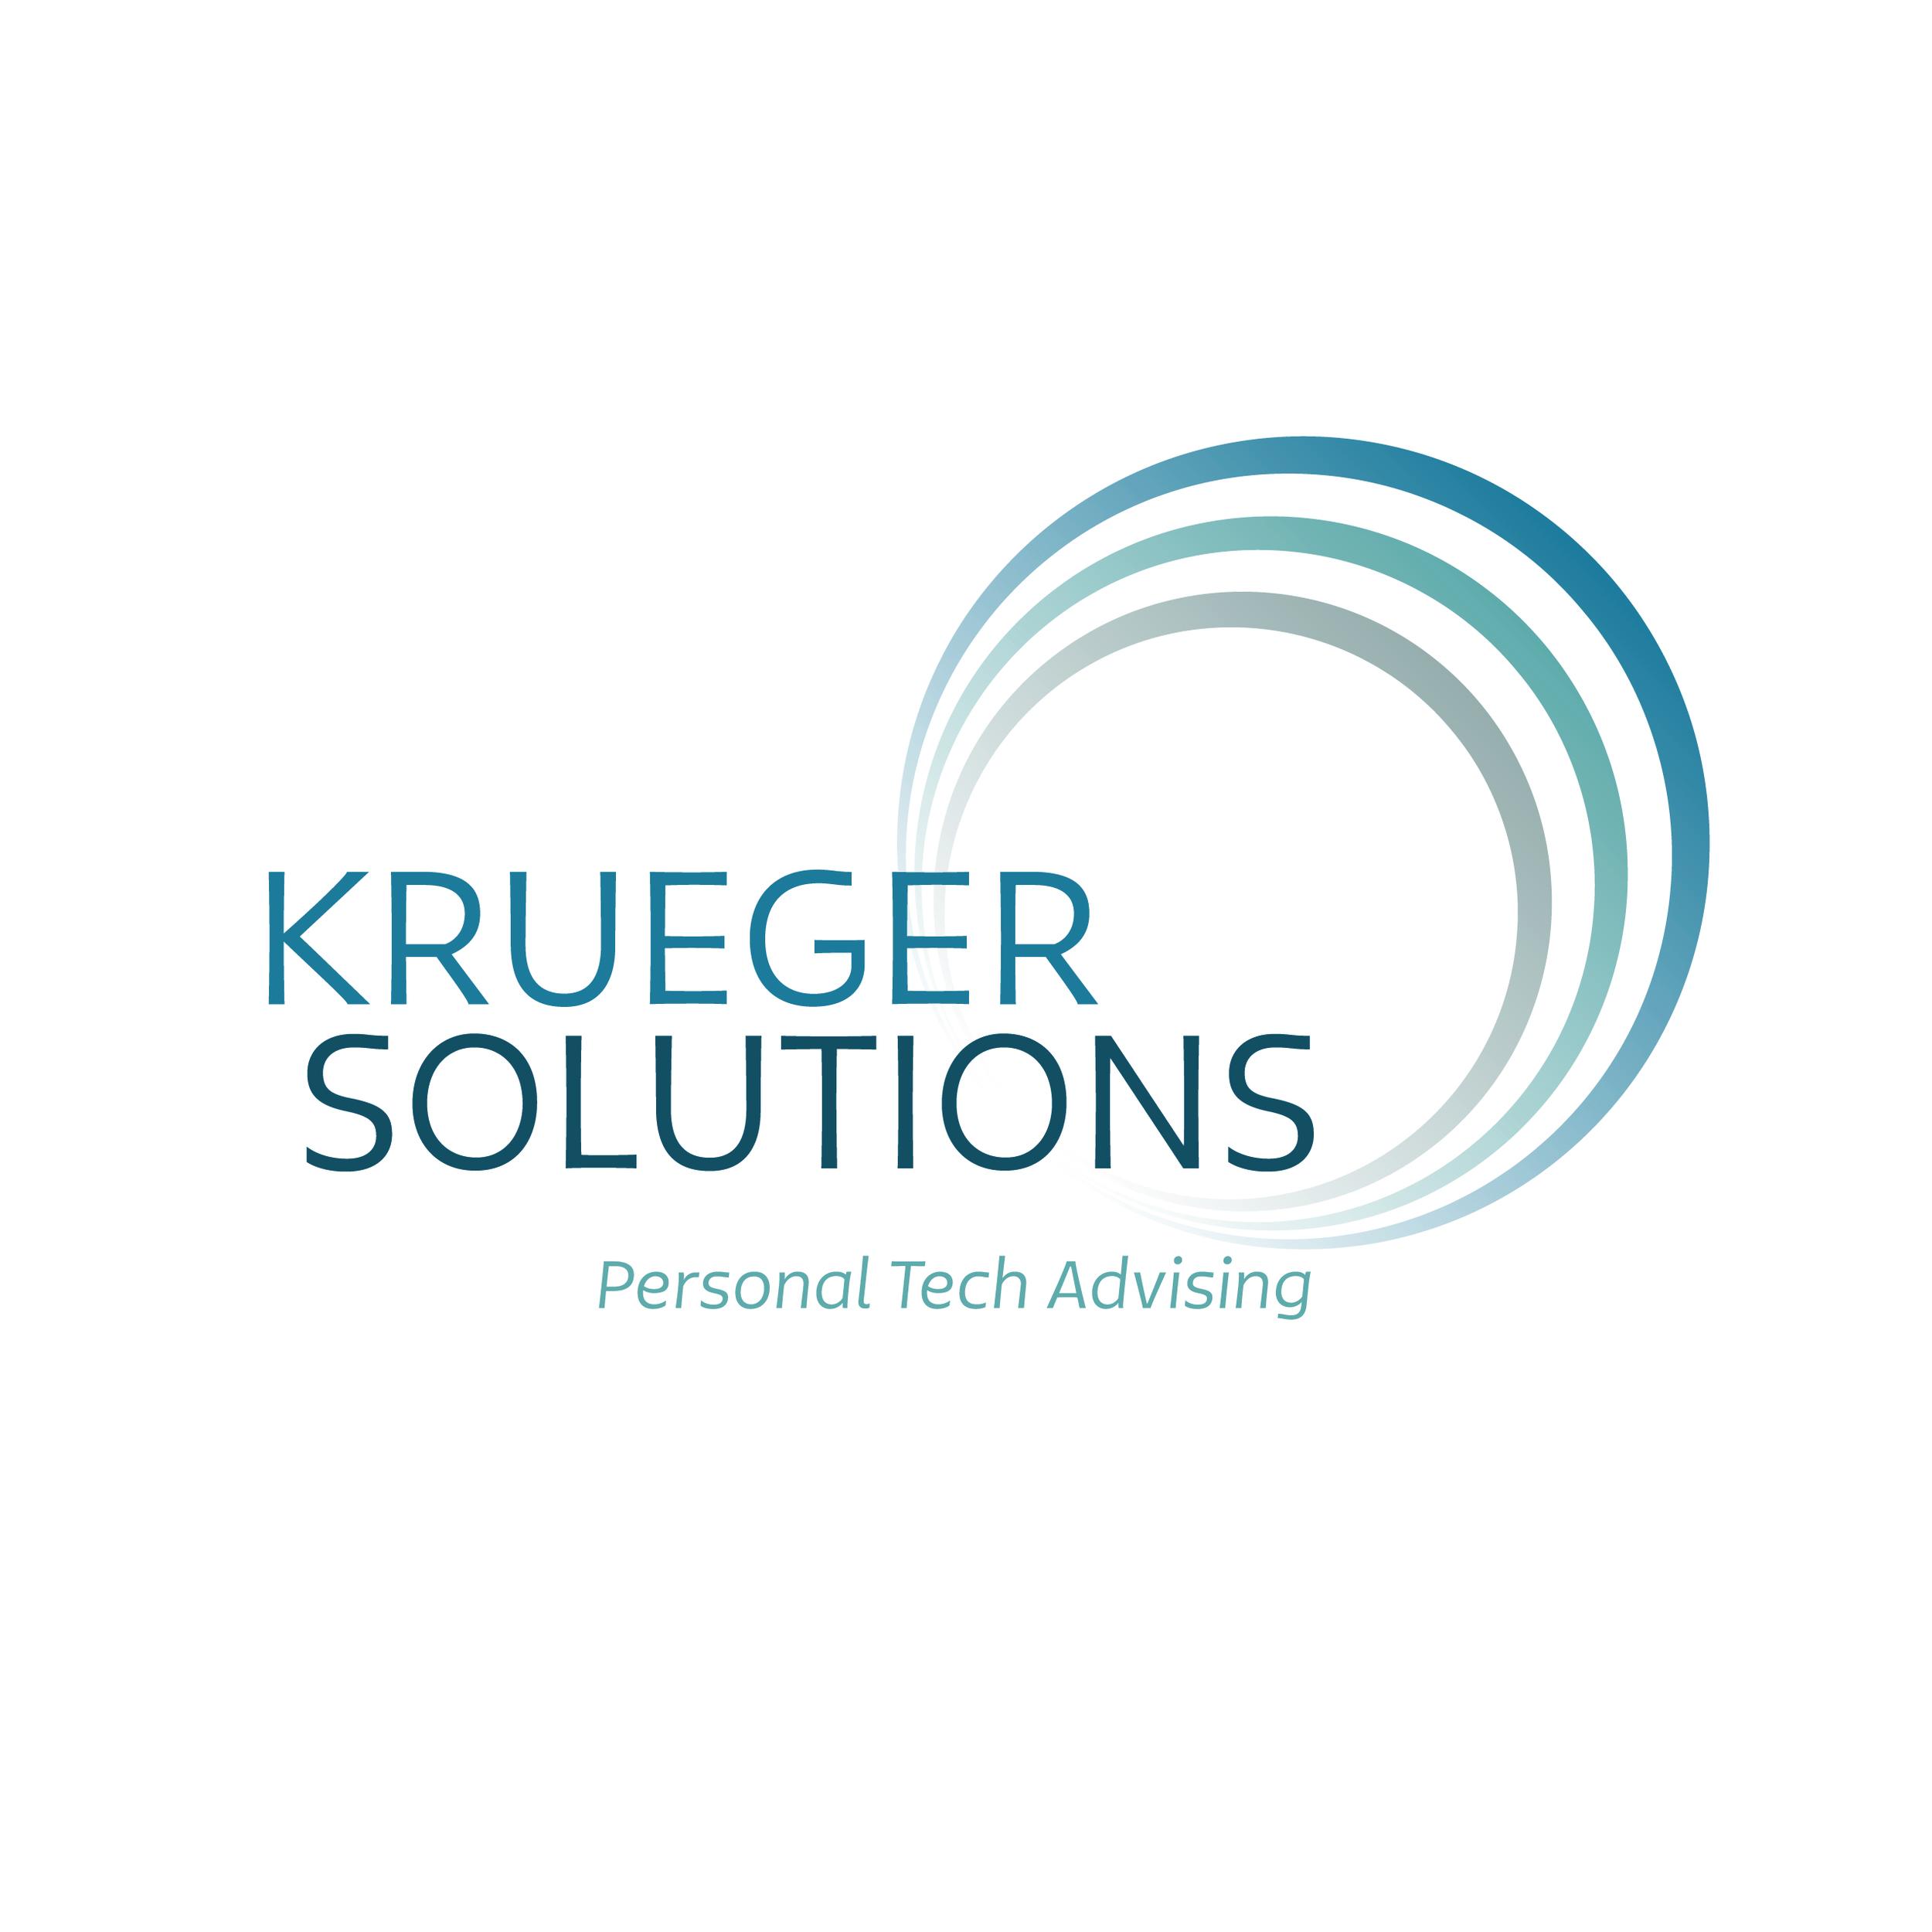 KruegerSolutions_CMYK.jpg